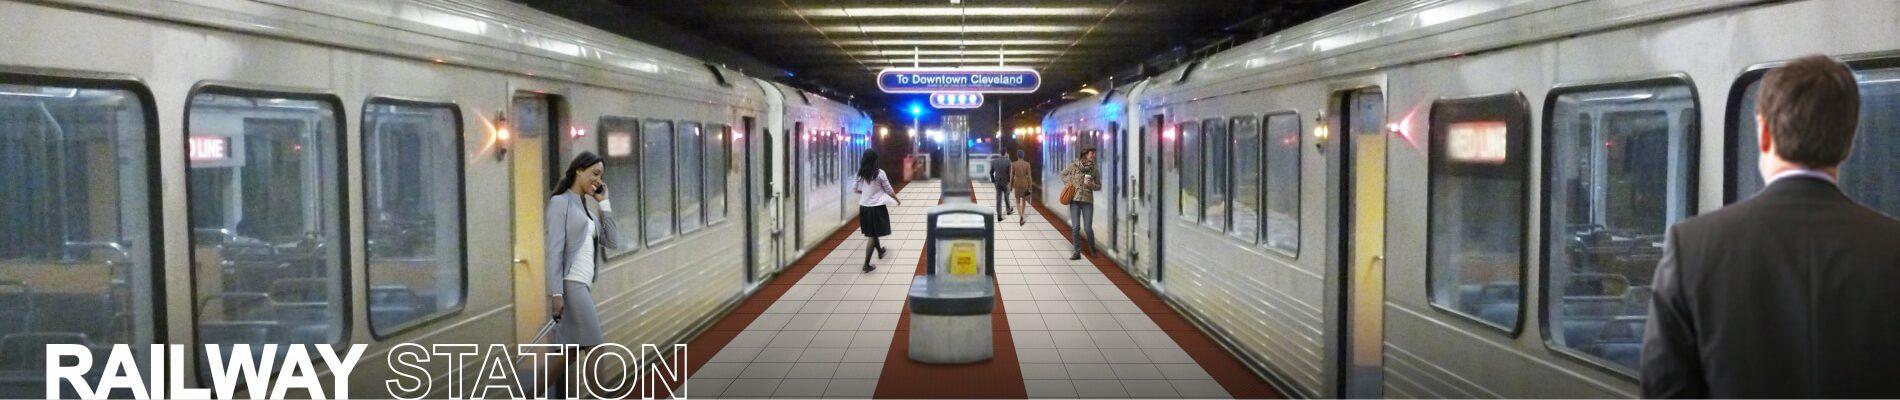 18_railway station